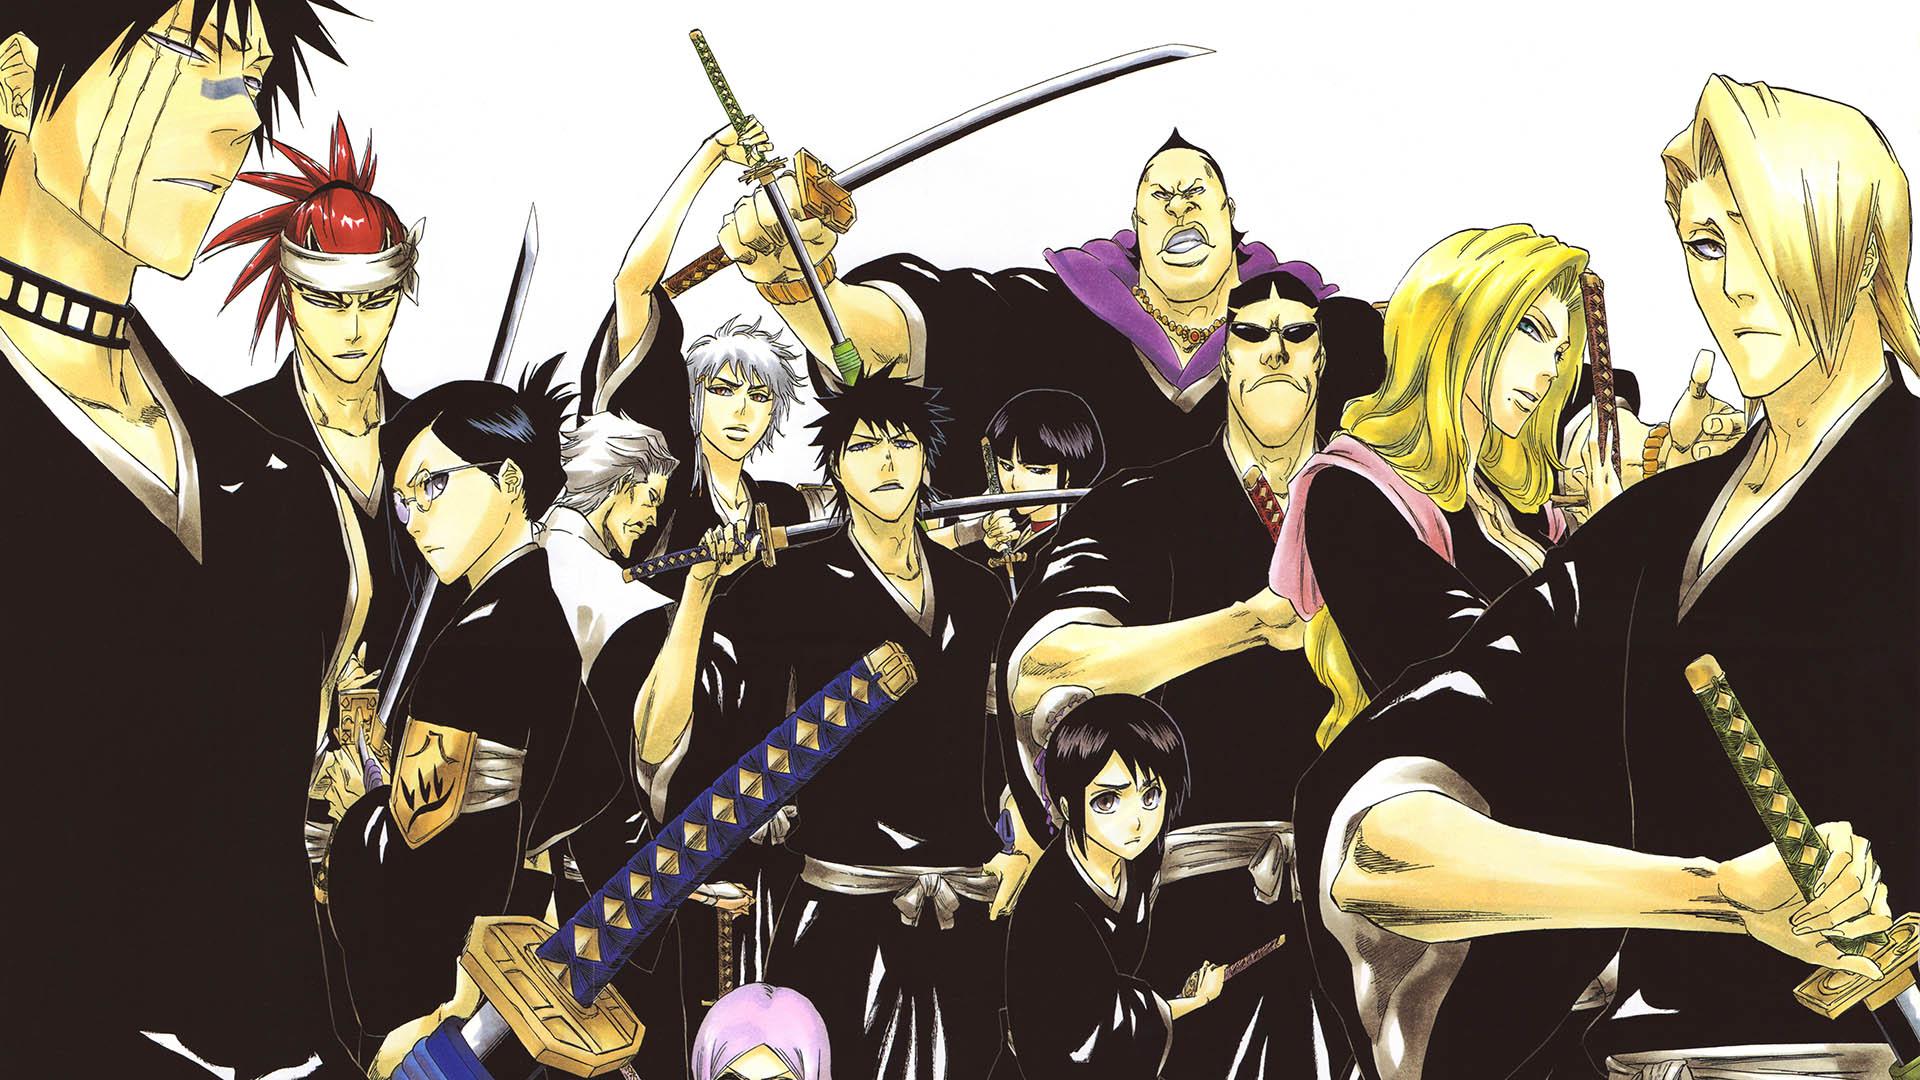 Il mondo degli anime e dei manga Anime-bleach-manga-01